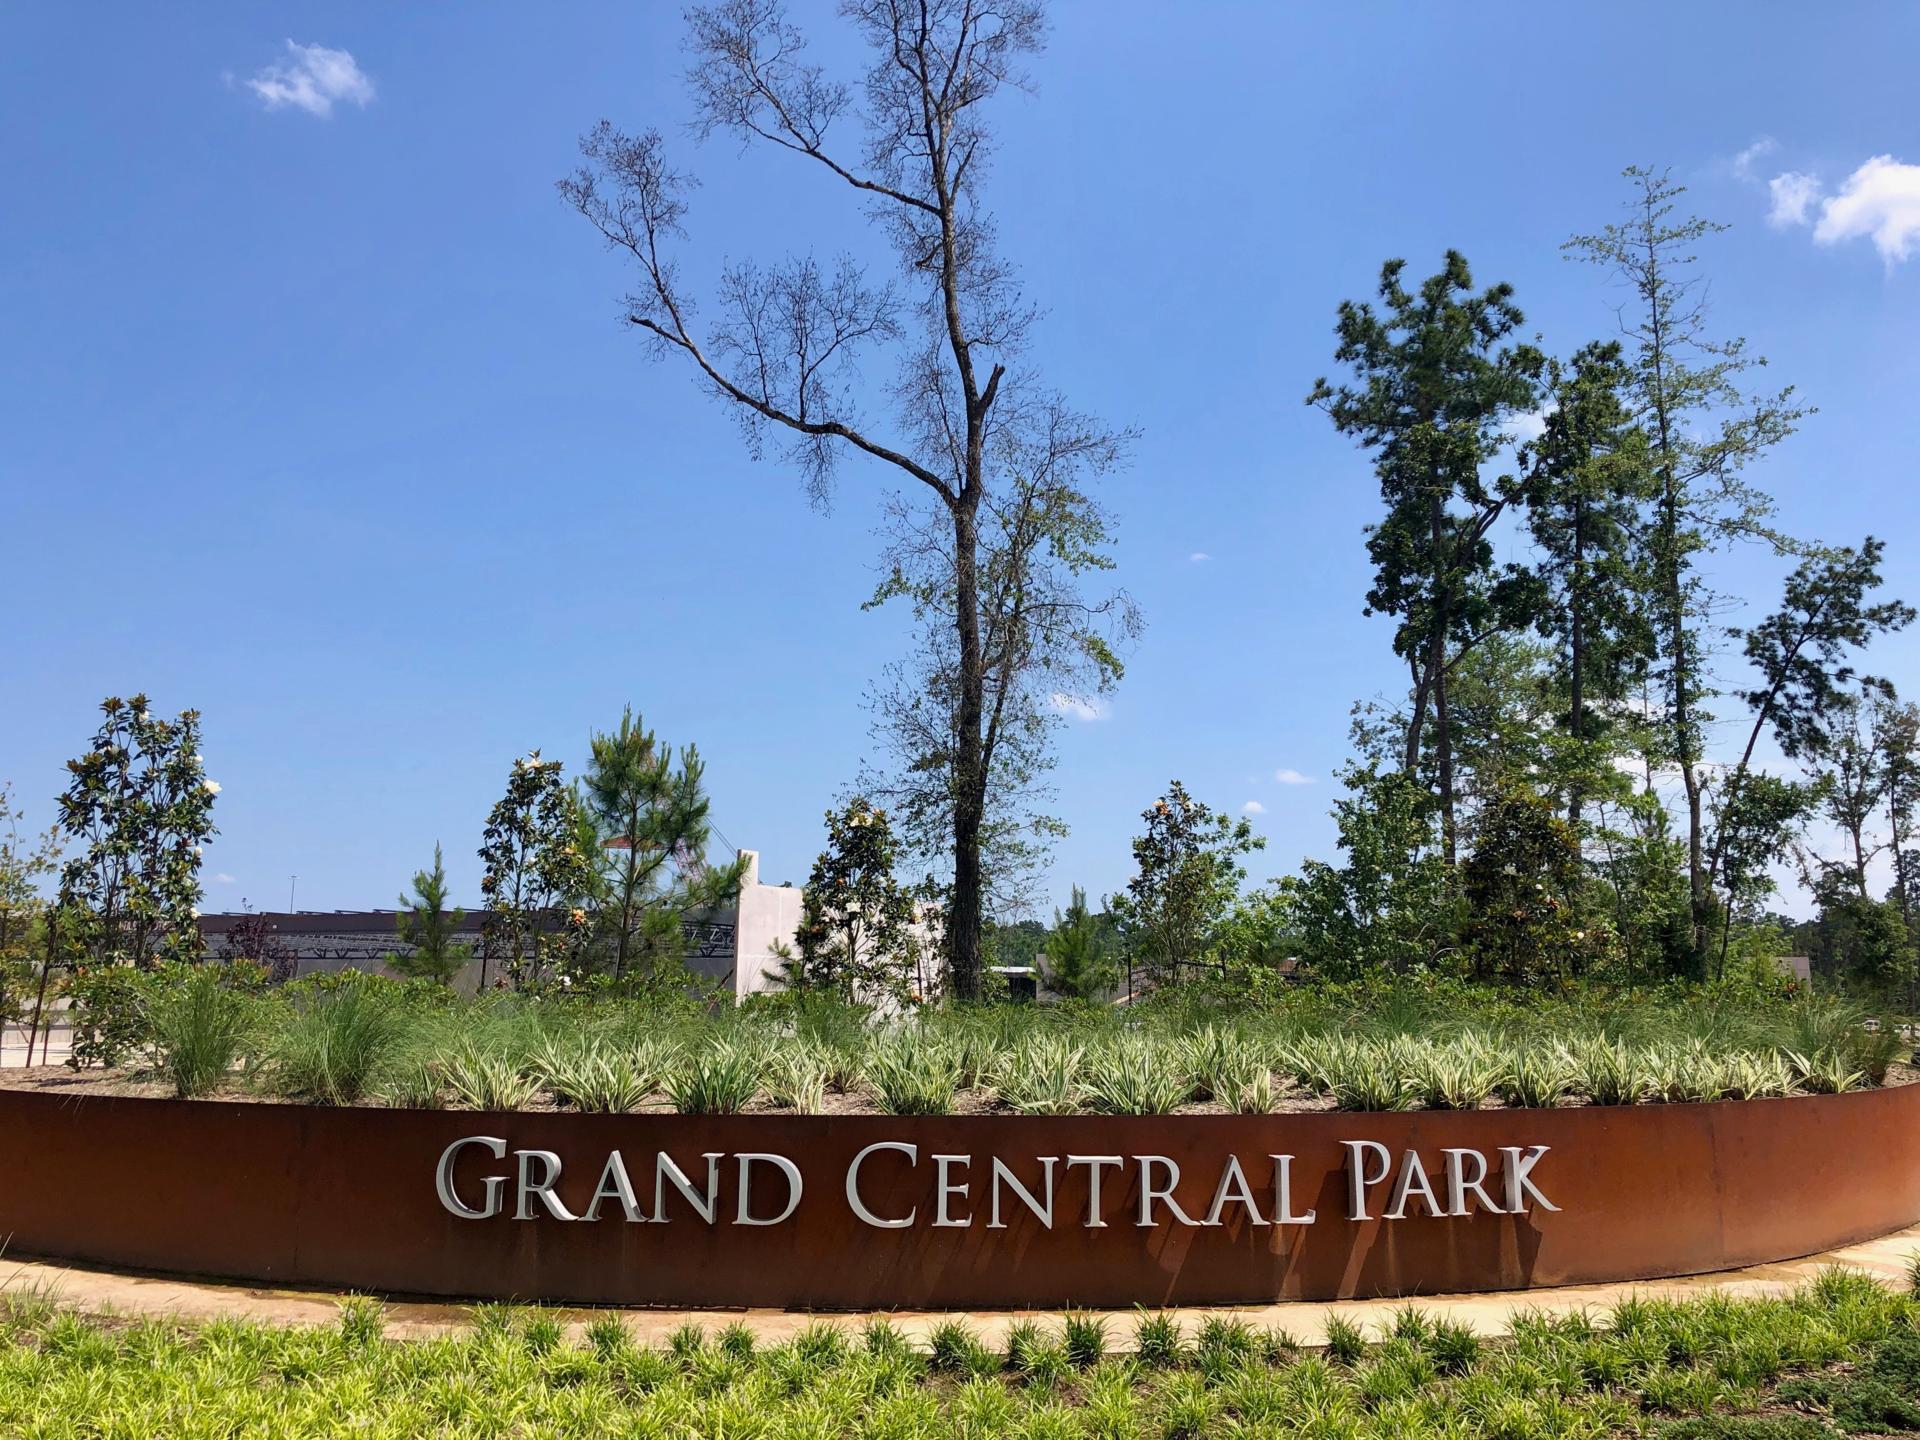 Grand Central Park Entrance